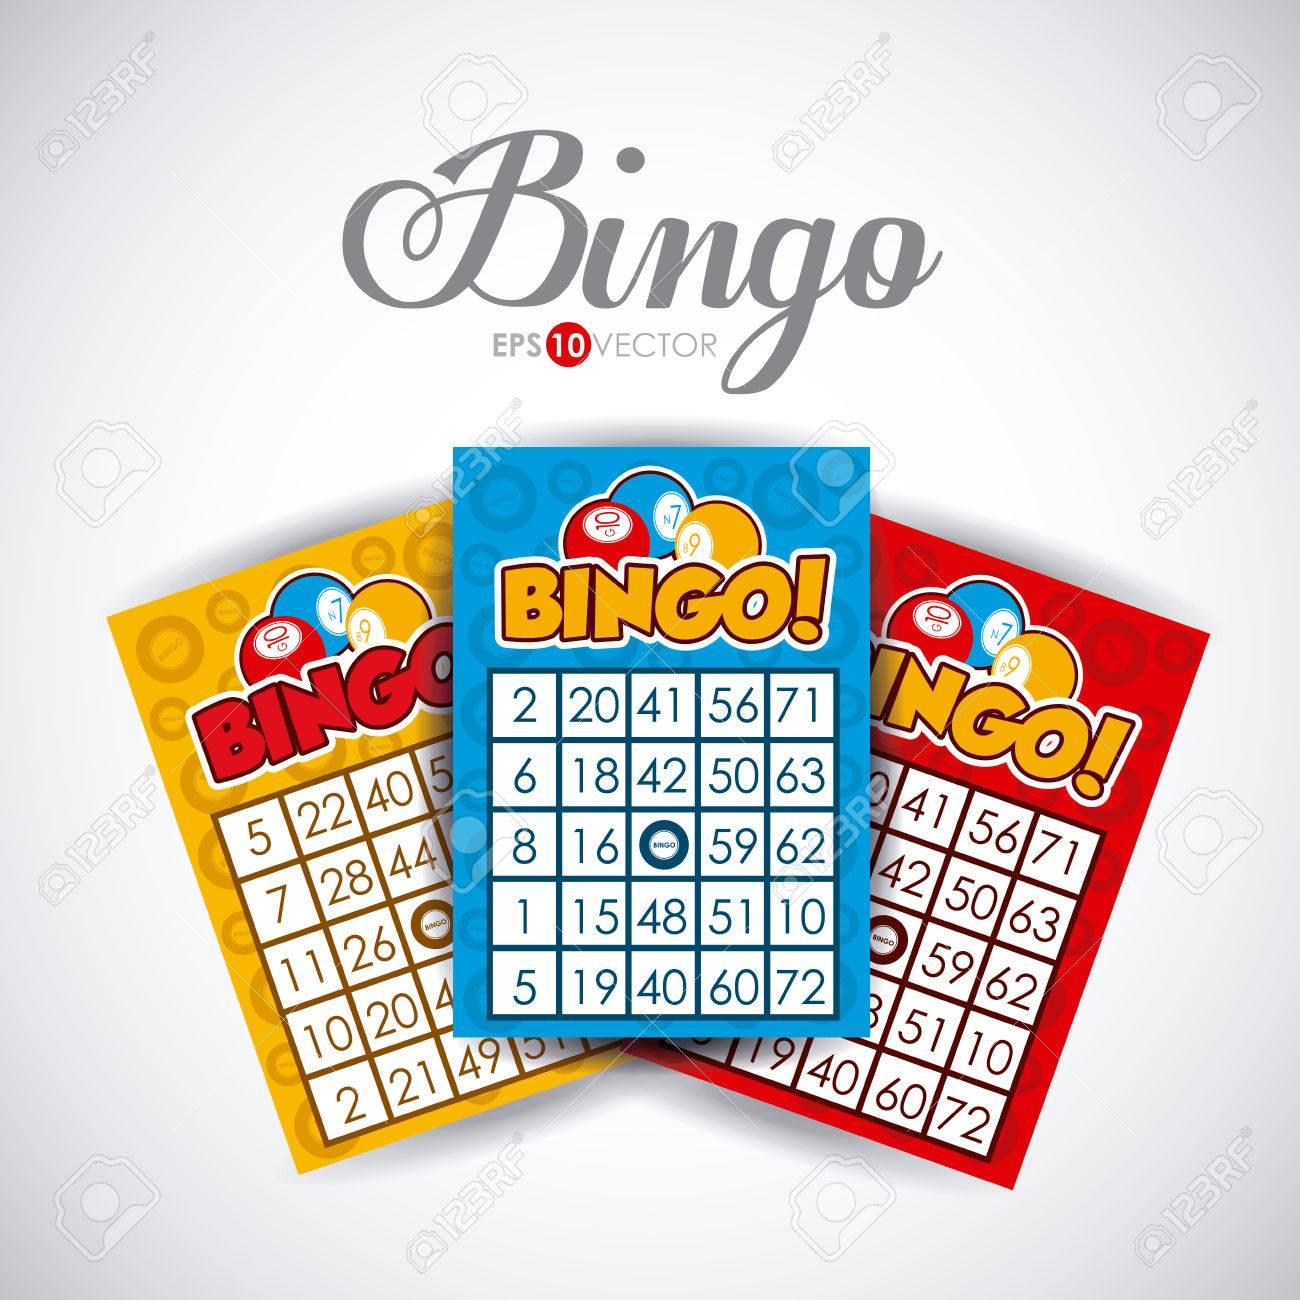 Bingo design over white background, vector illustration. - 36249999